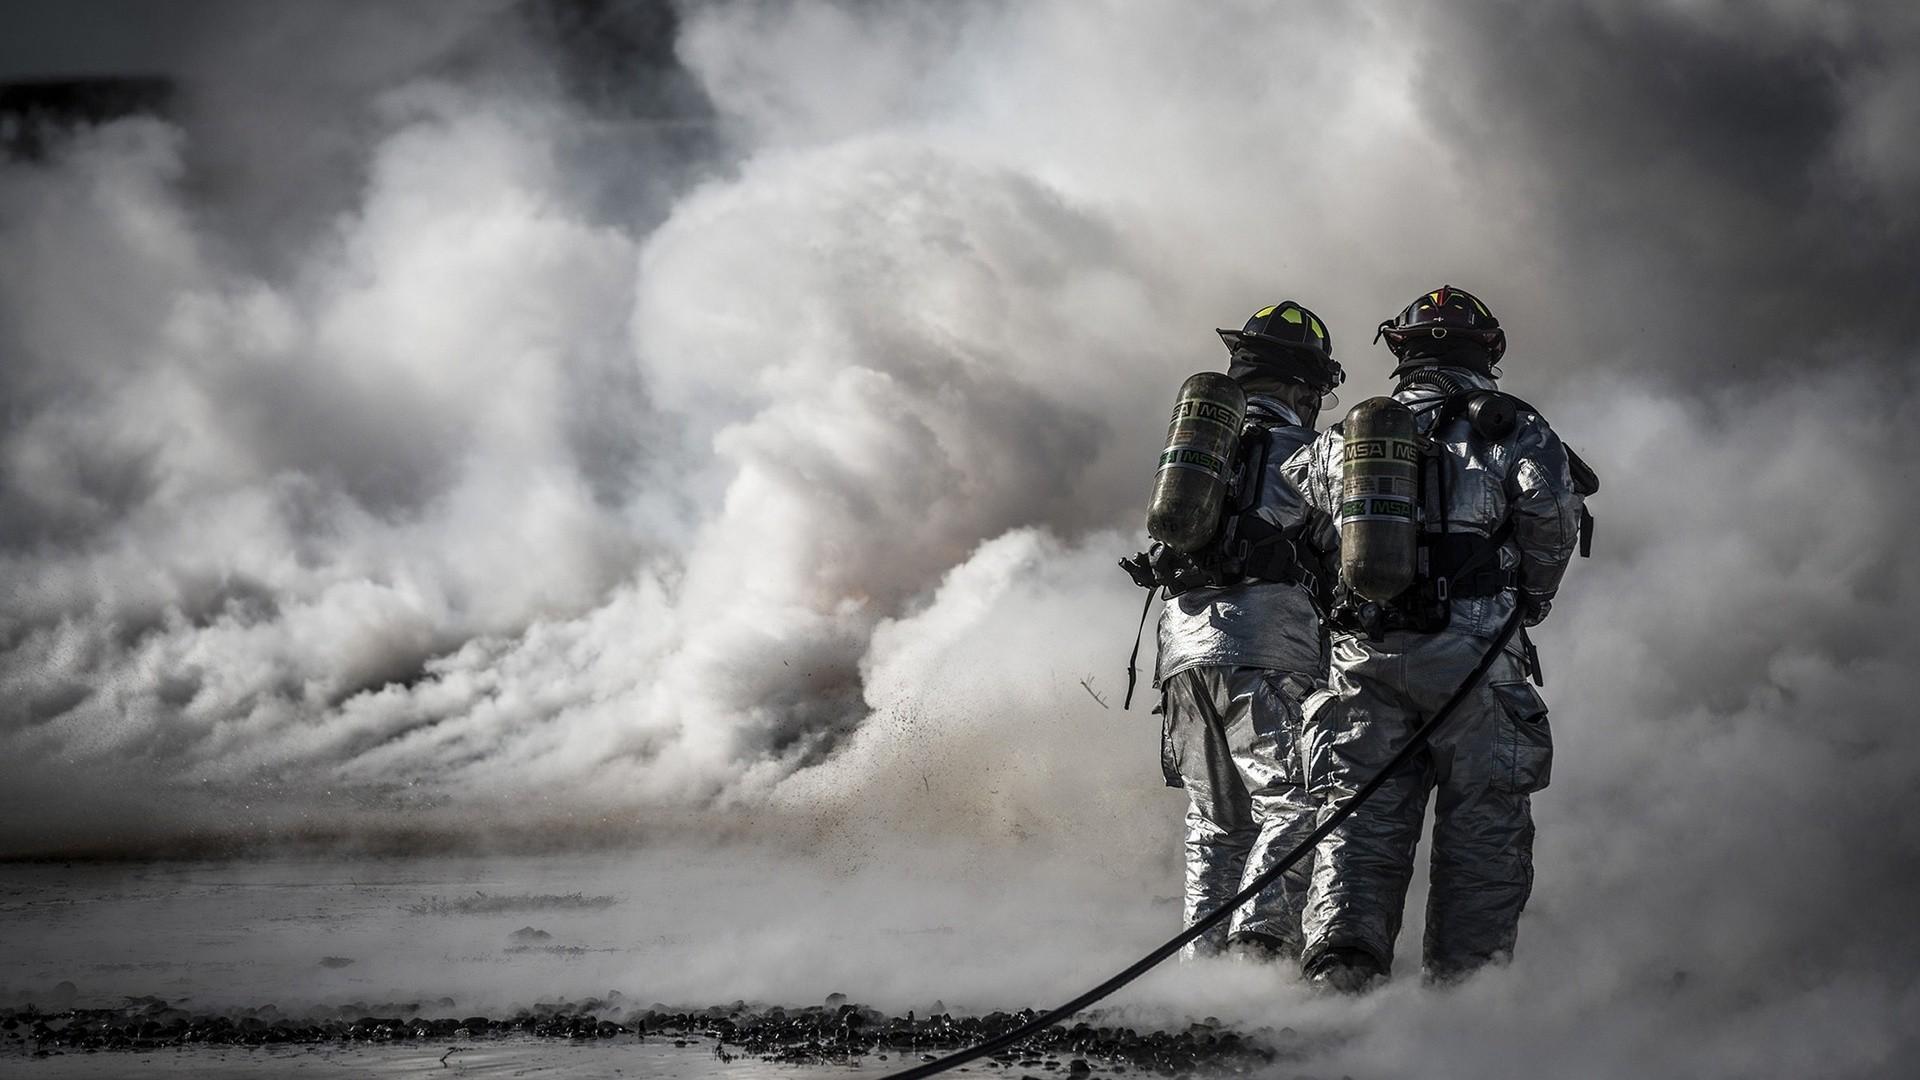 Wallpaperwiki Fire Department Backgrounds Desktop PIC WPB003092